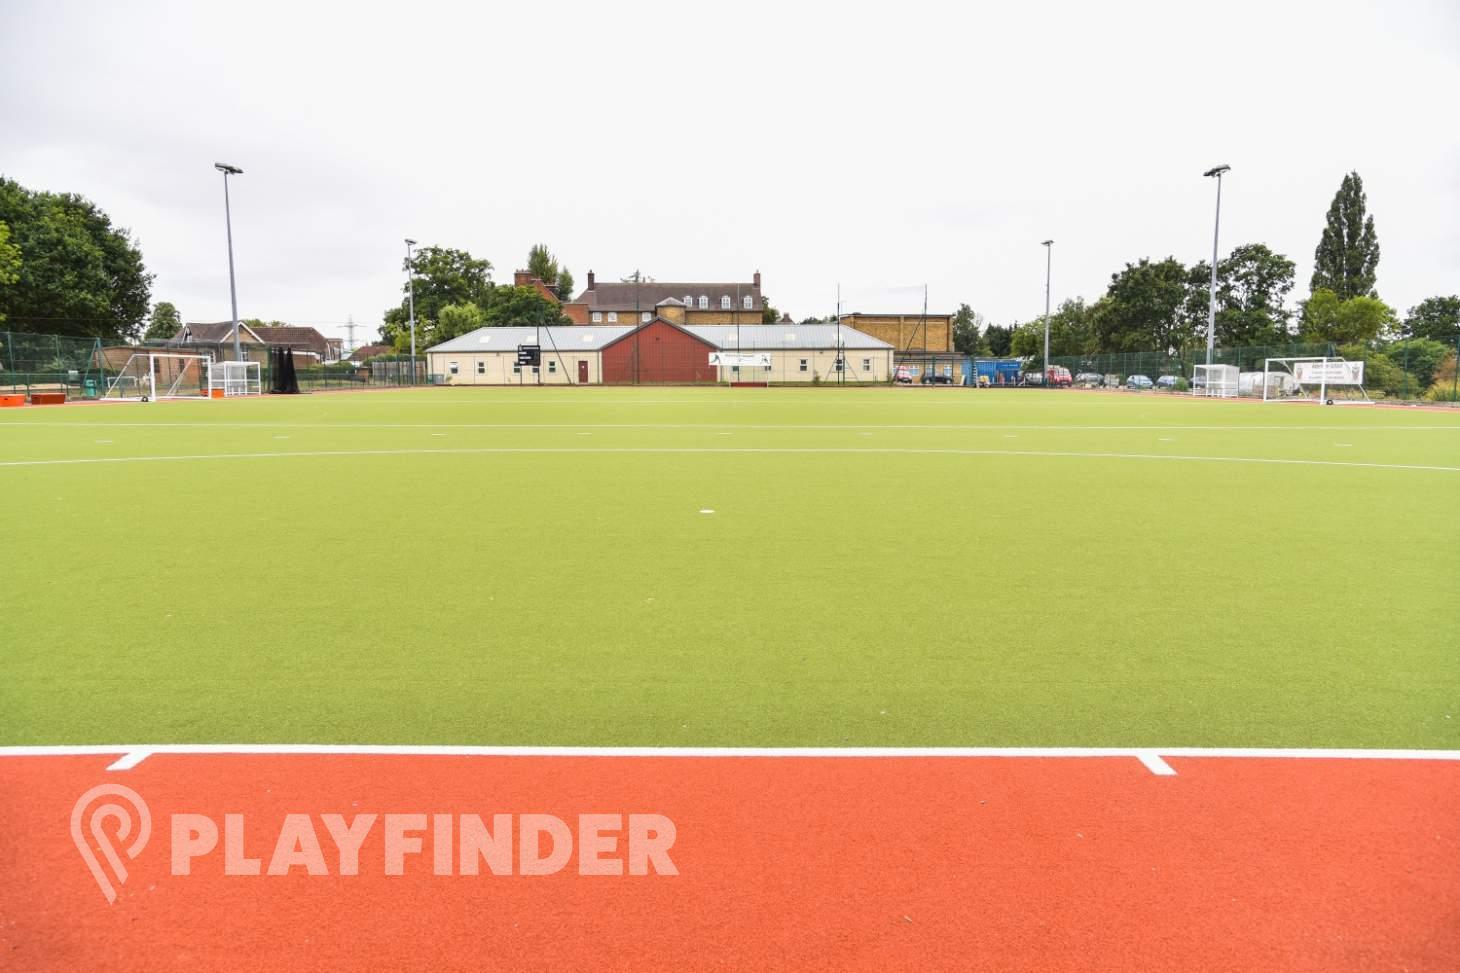 Aldenham School Sports Centre 9 a side   Astroturf football pitch